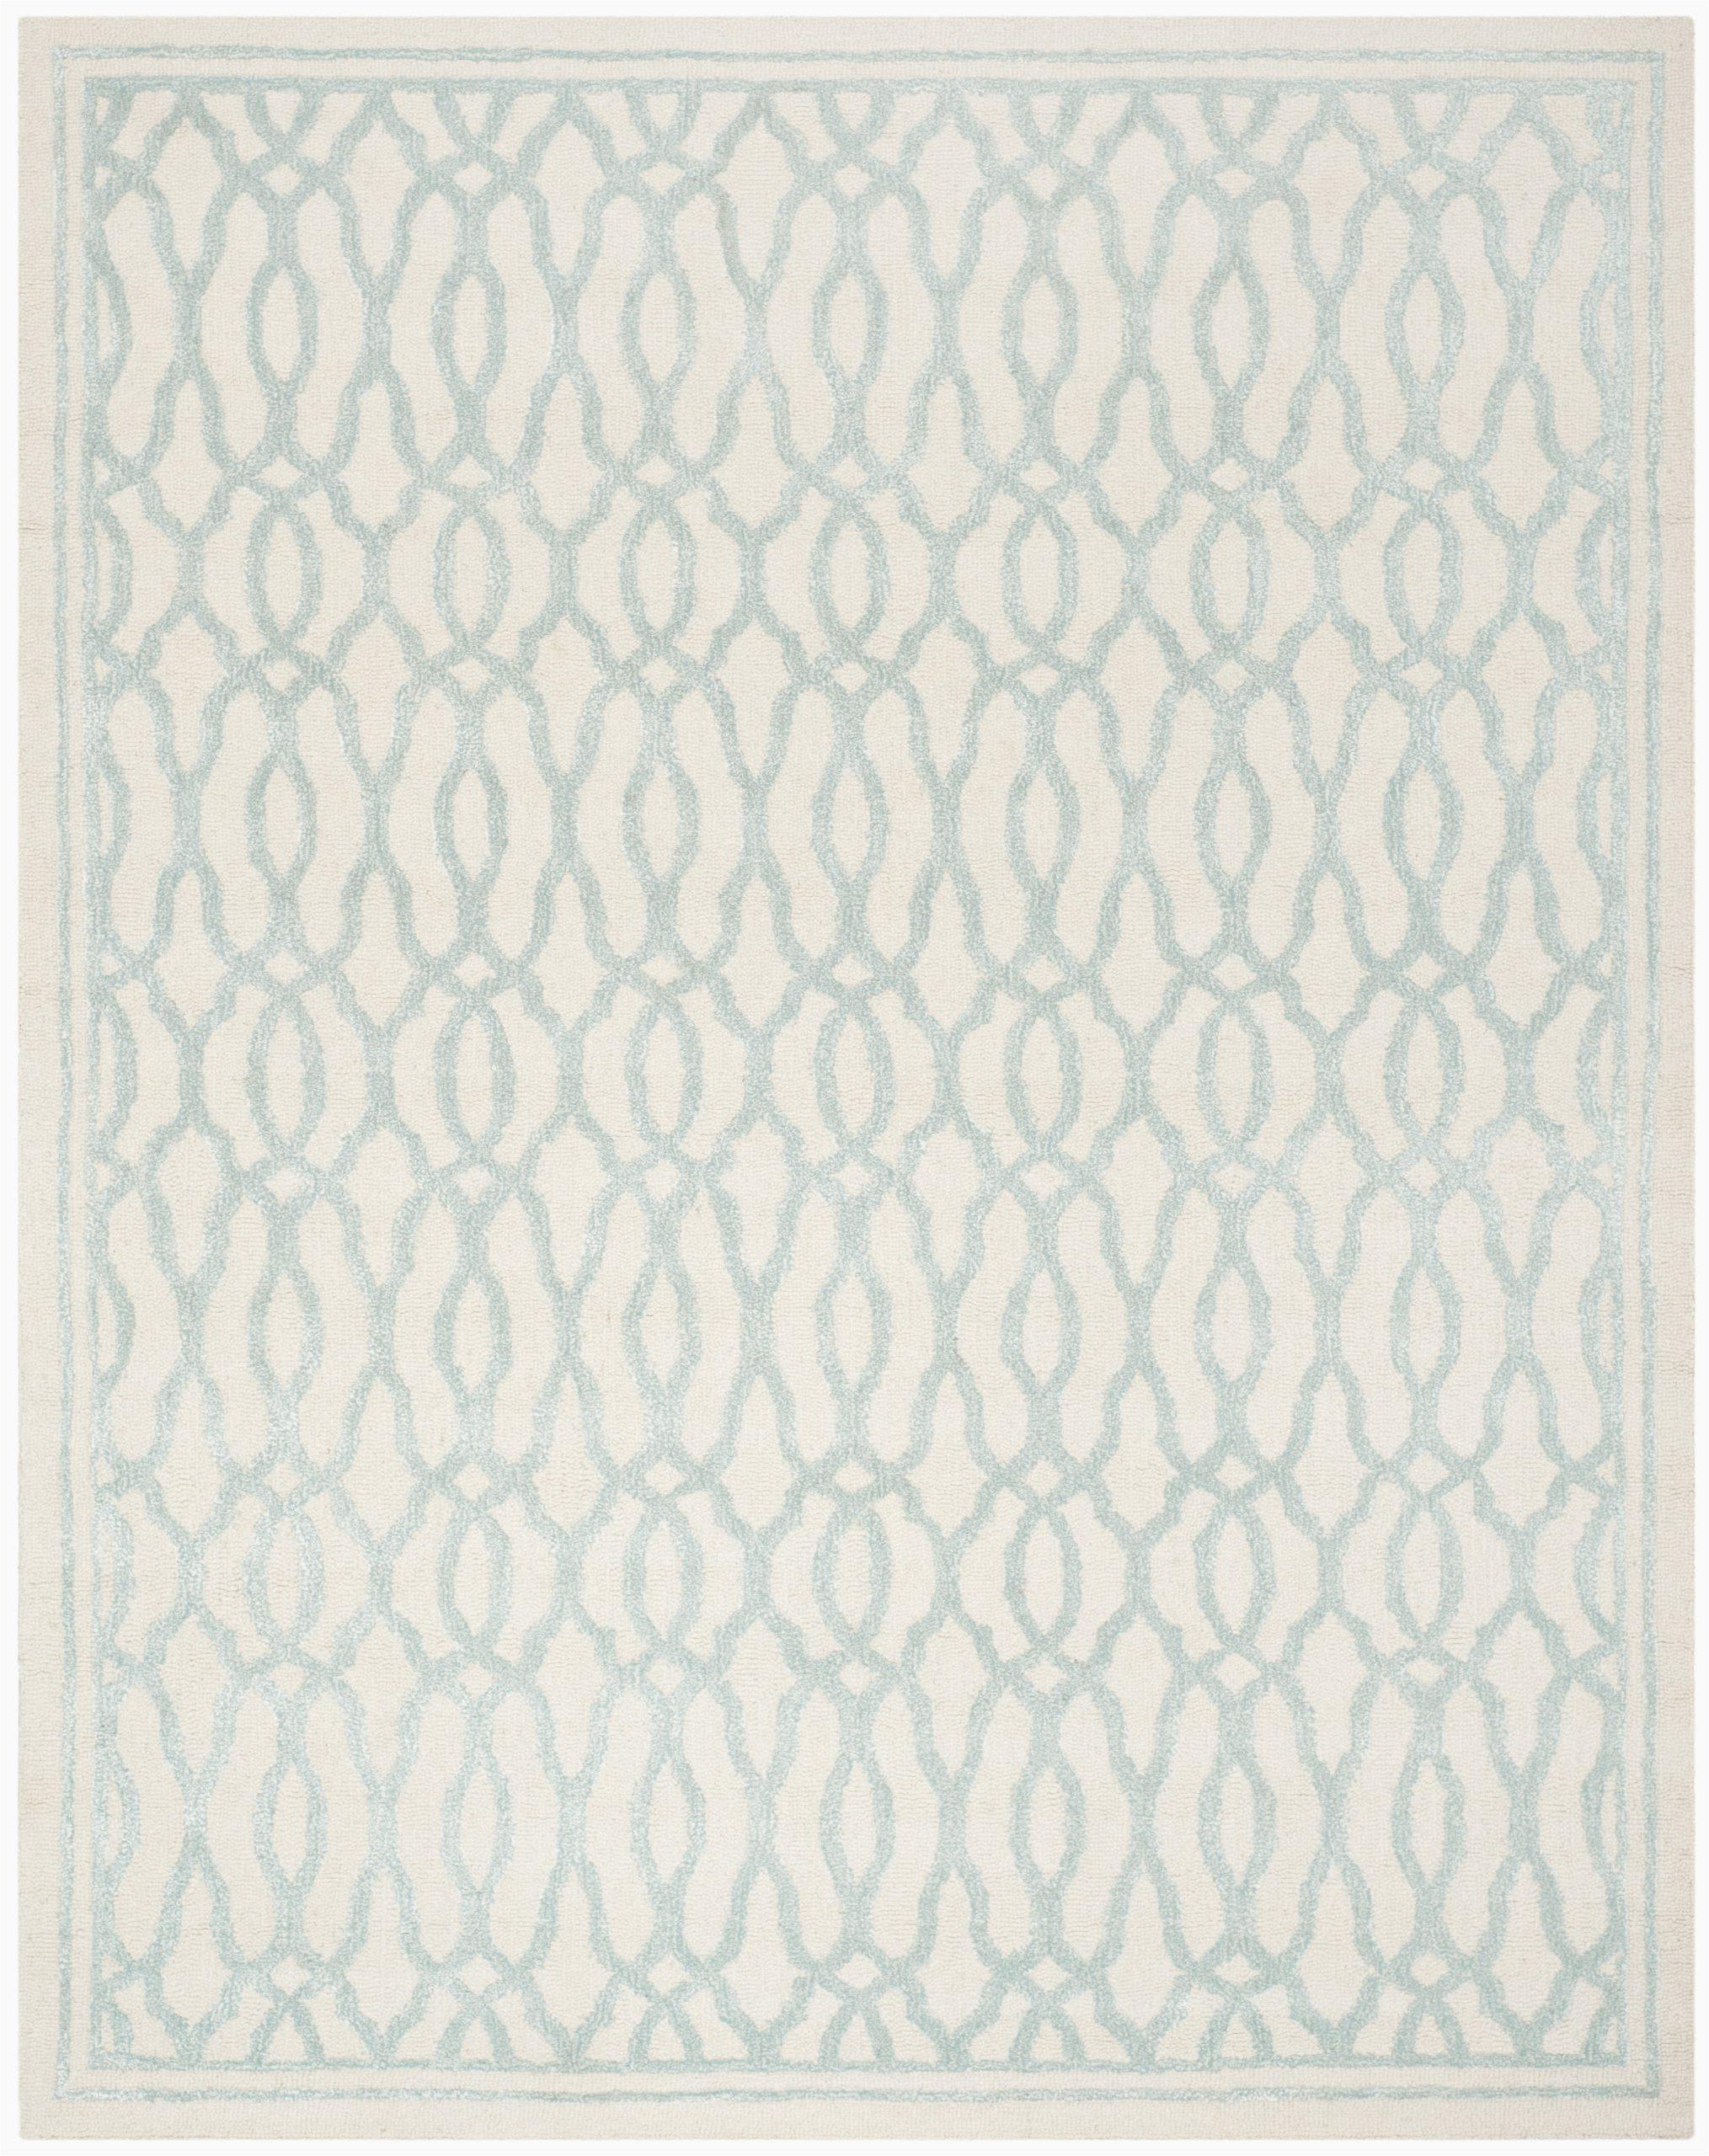 martha stewart hand tufted ivoryteal blue area rug